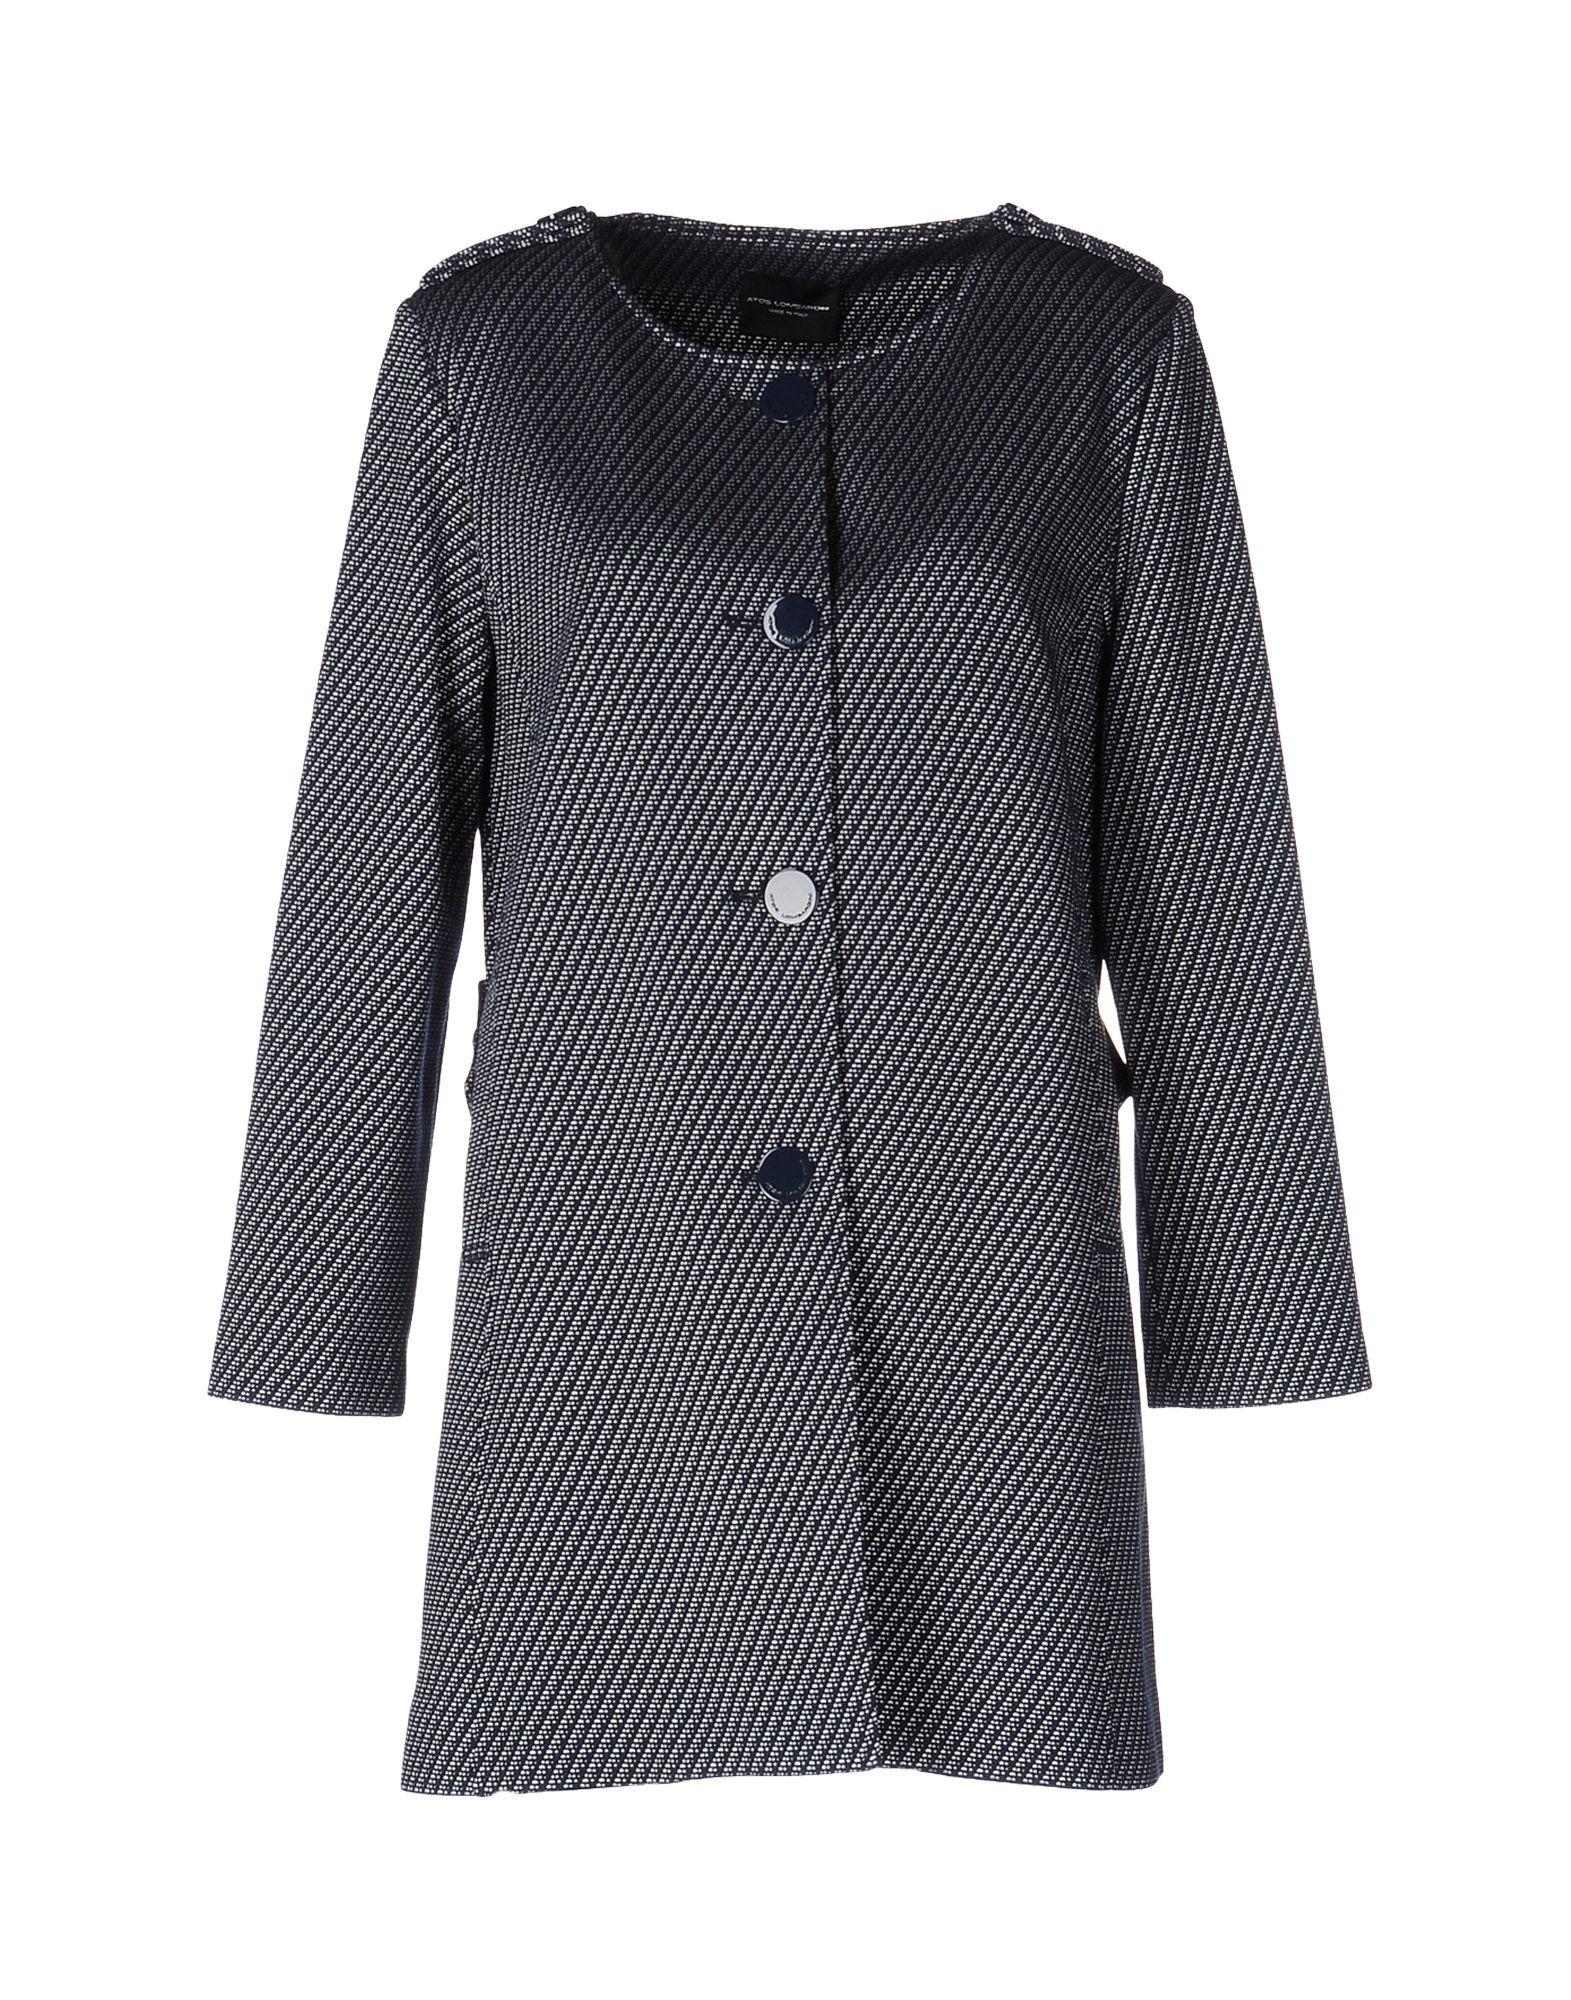 ATOS LOMBARDINI Легкое пальто atos lombardini легкое пальто